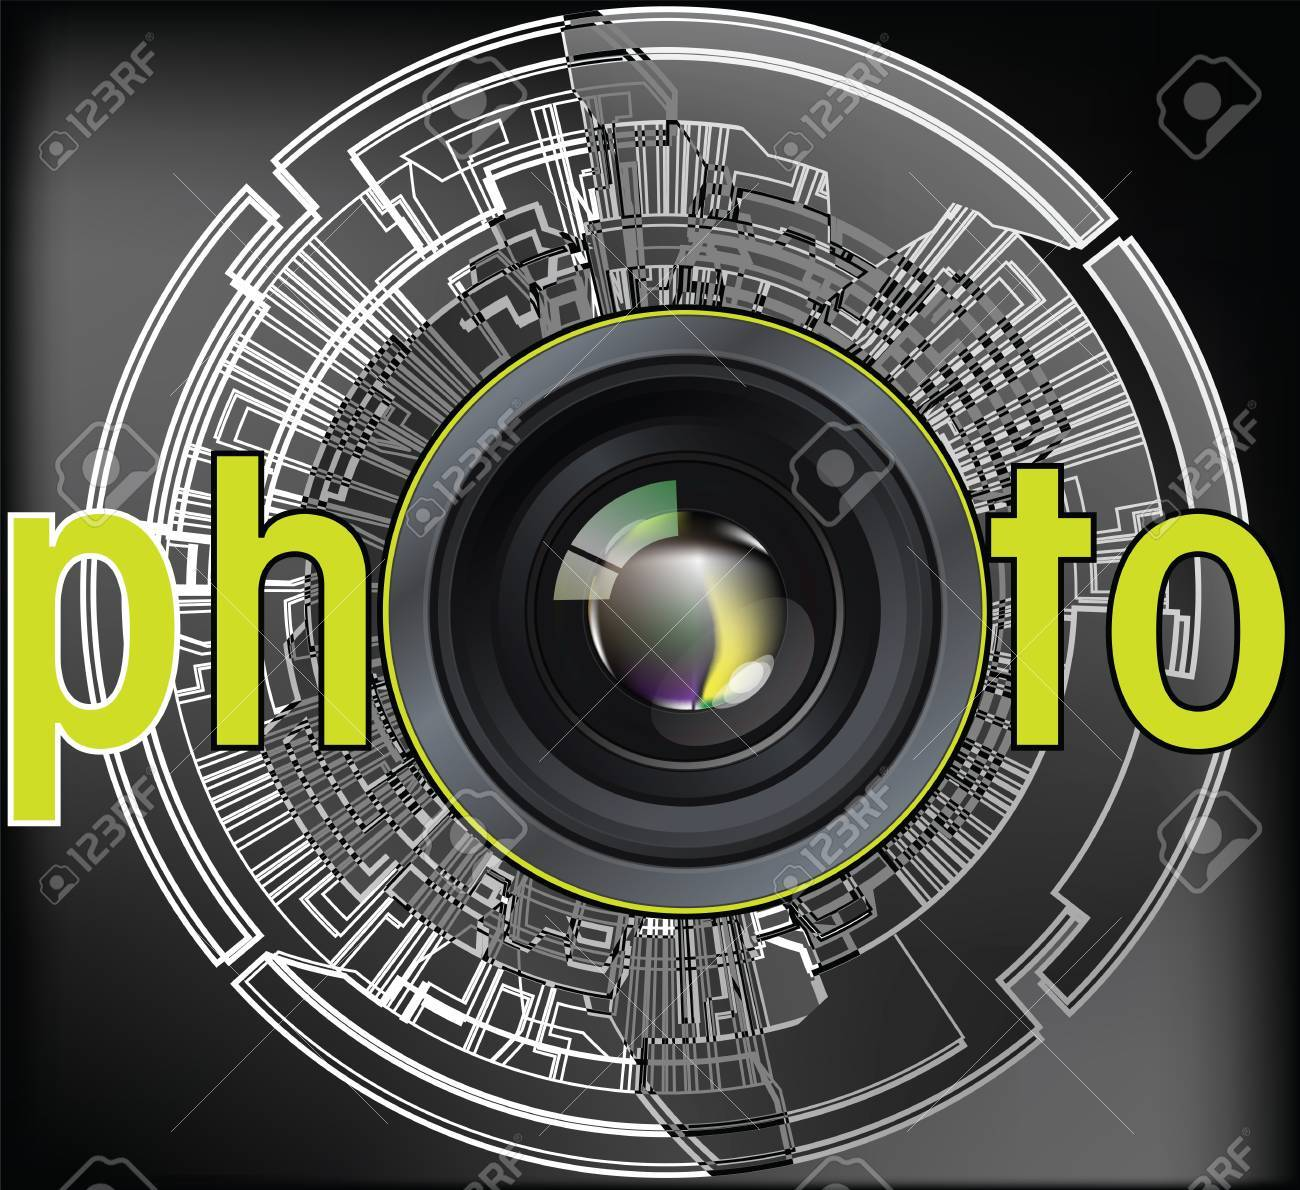 Professional photo lens. Editable vector illustration Stock Vector - 10916156